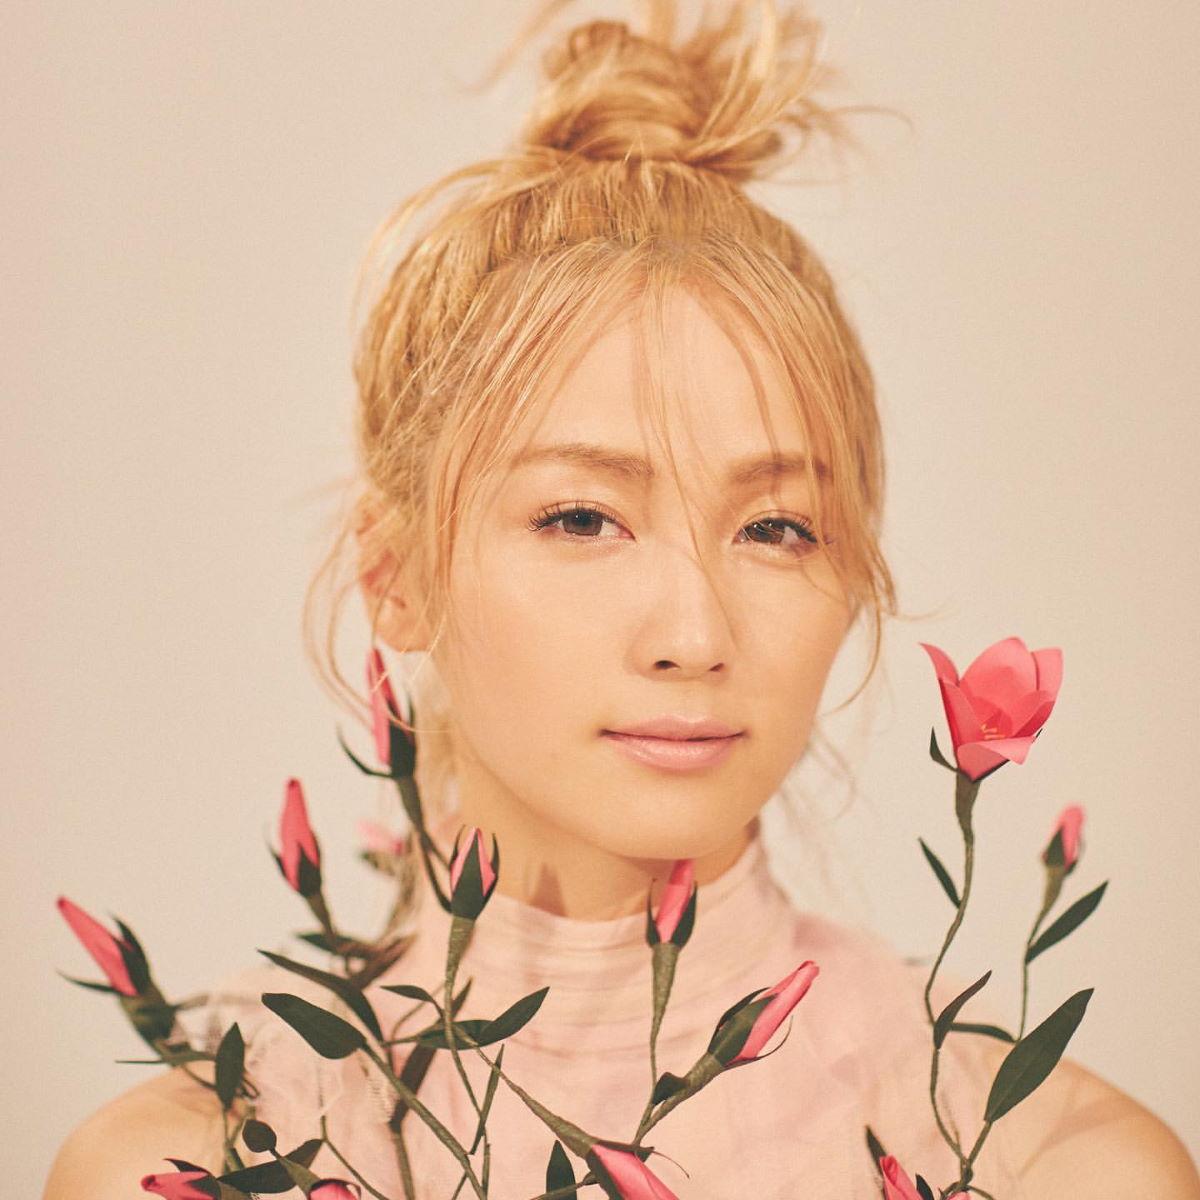 『Dream Ami恋のつぼみ』収録の『恋のつぼみ』ジャケット